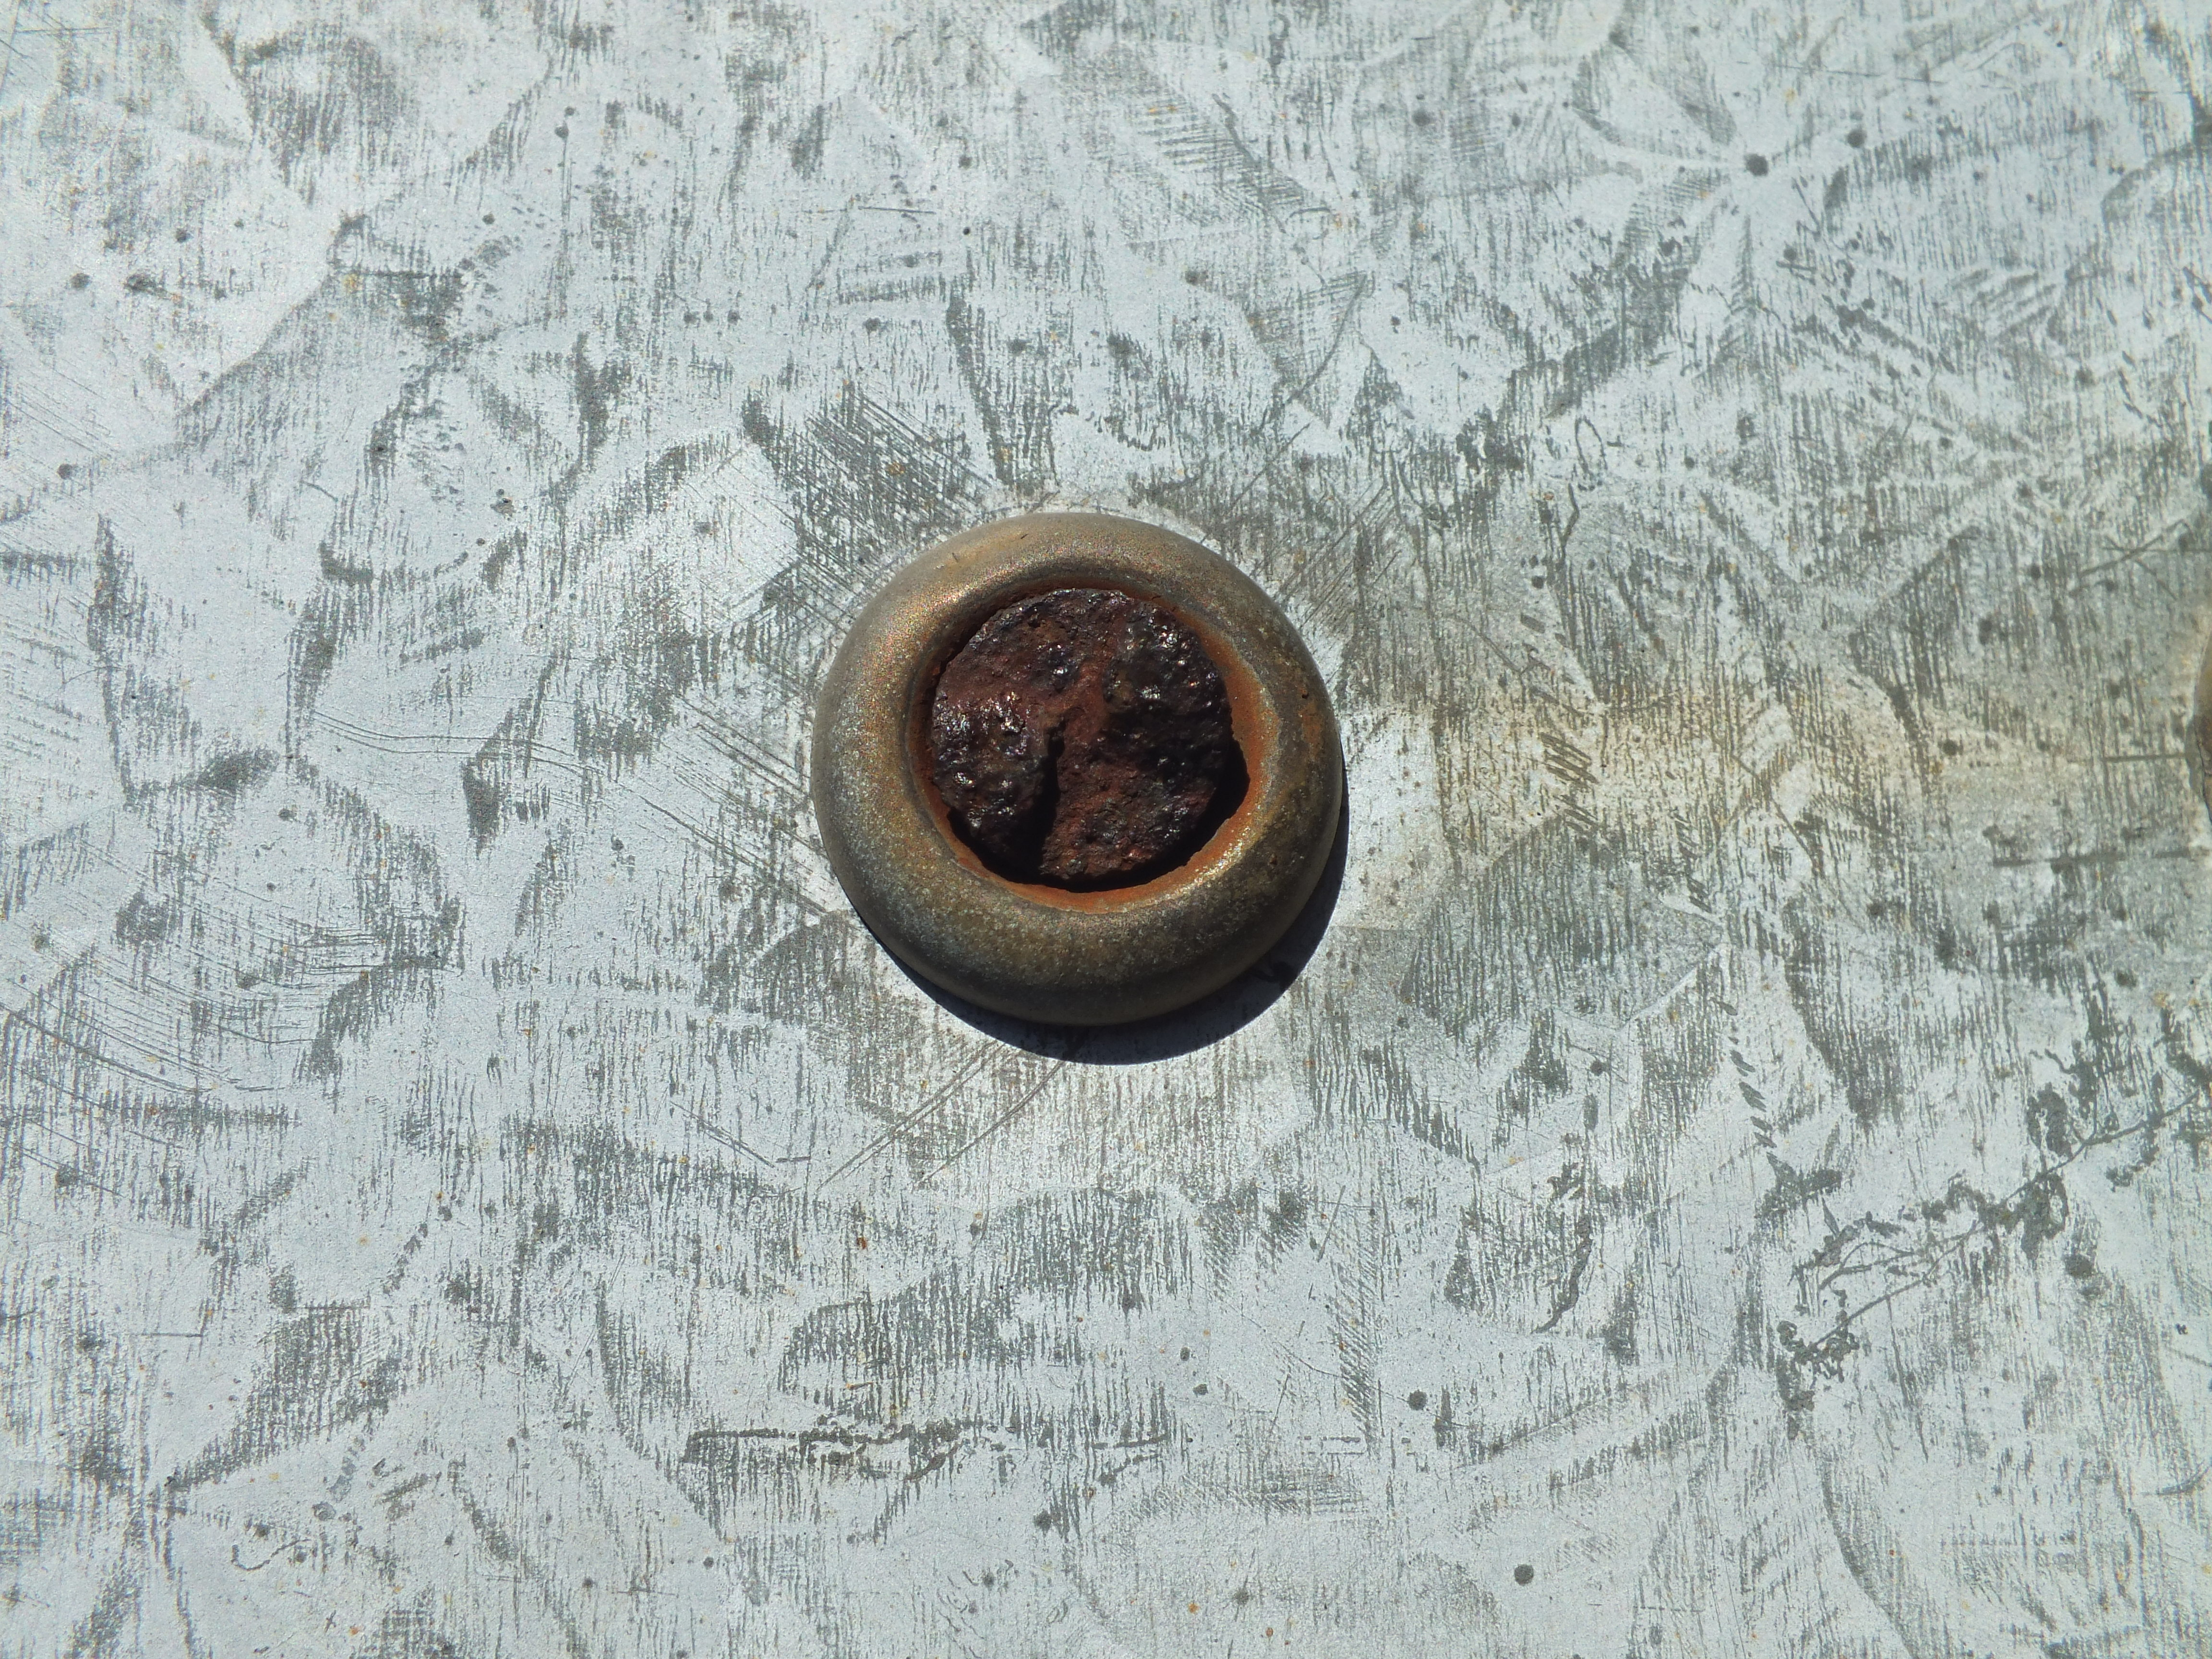 Rusty Screw, Metal, Rusty, Screw, HQ Photo